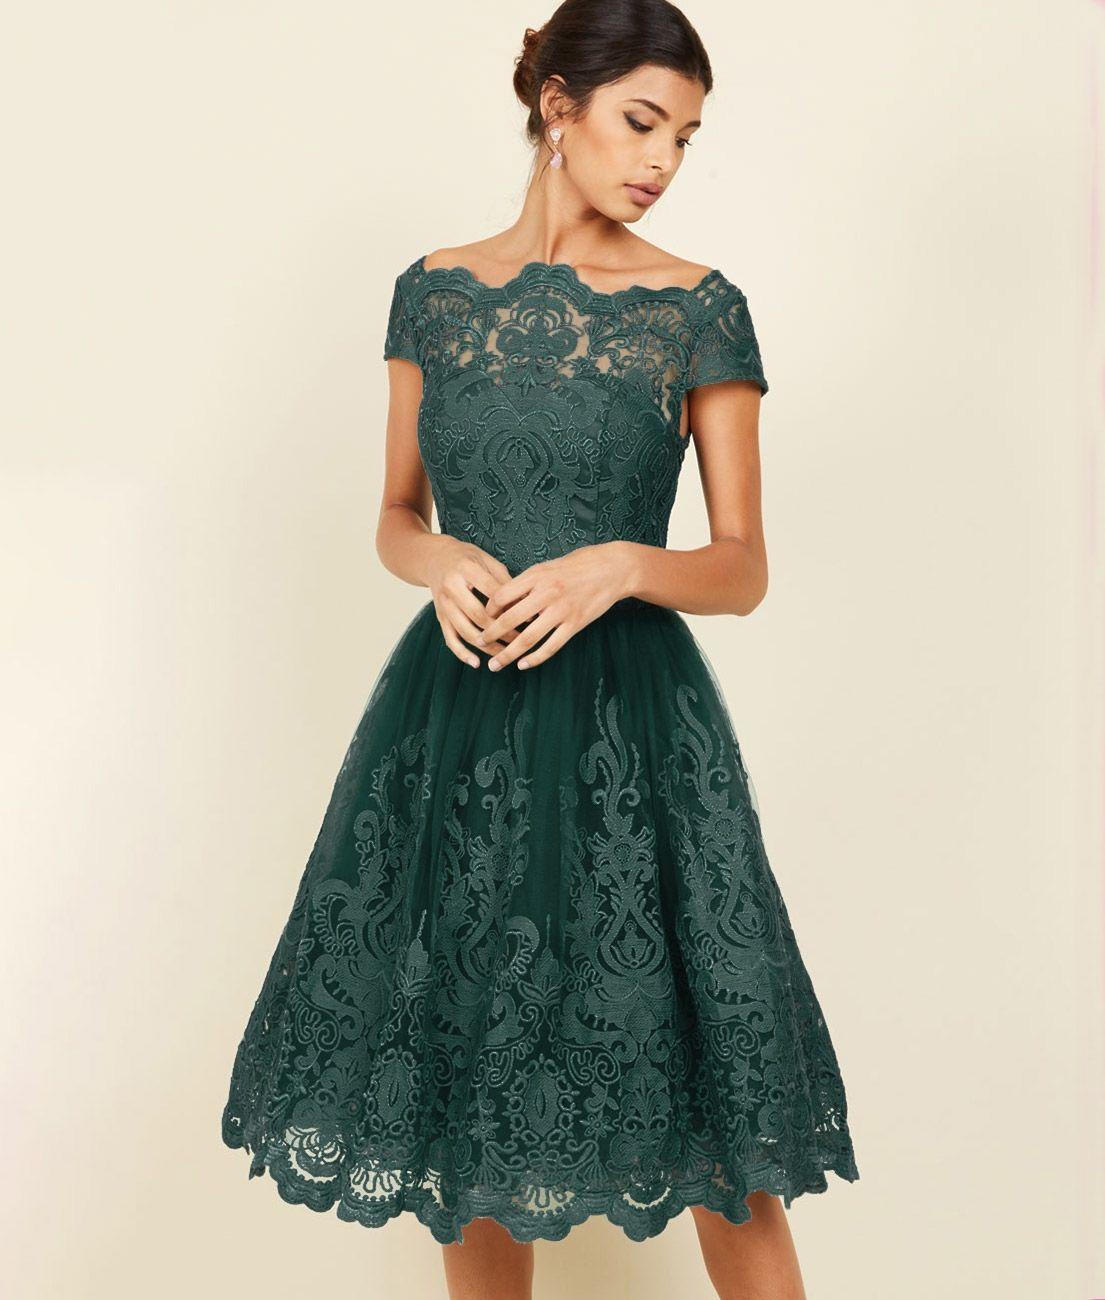 7574afaed3 Sukienka butelkowa zieleń koronkowa rozkloszowana midi balowa w 2019 ...